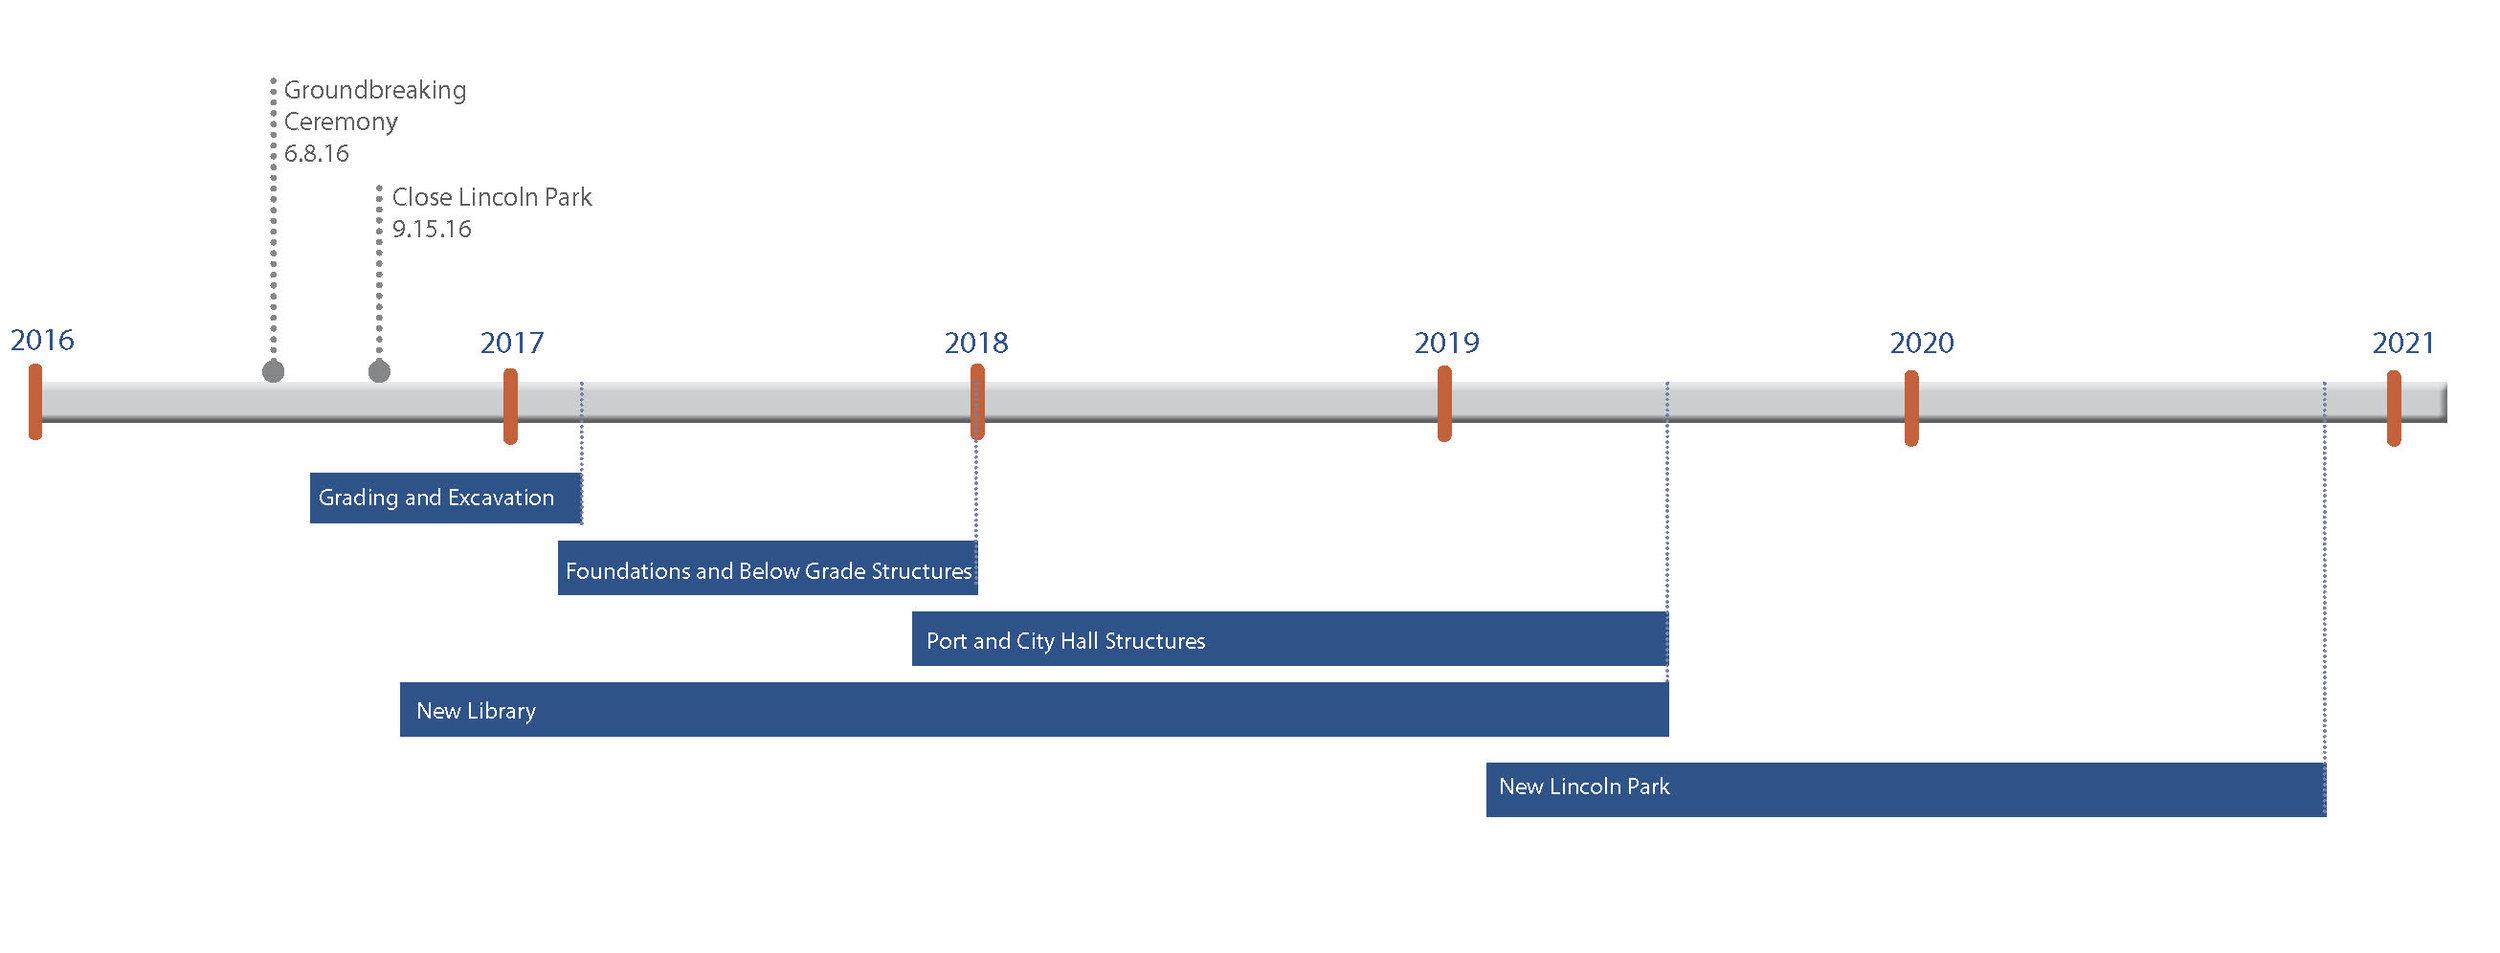 Major Milestone Timeline